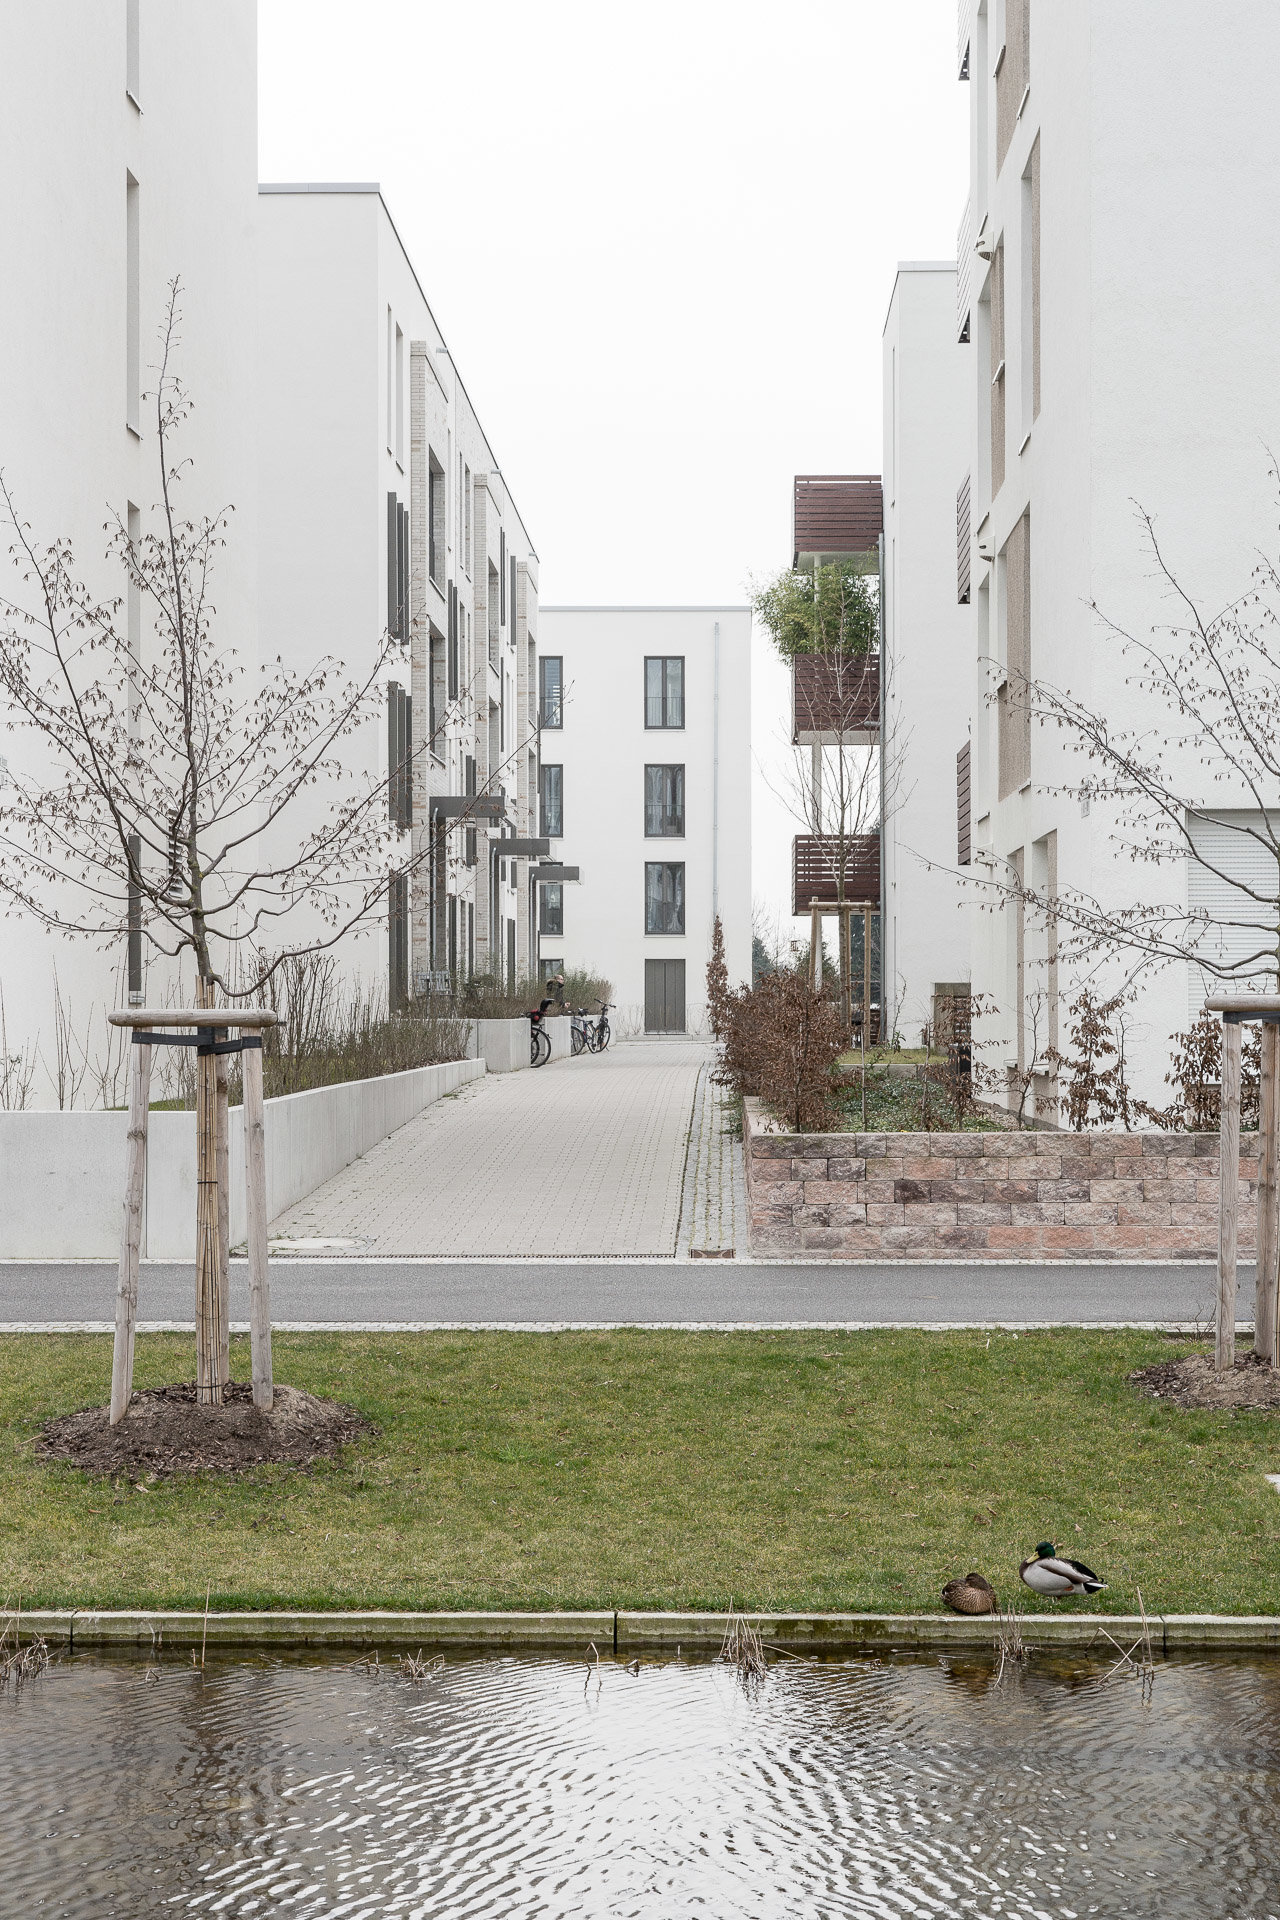 Bahnstadt_10.03.15-91.jpg